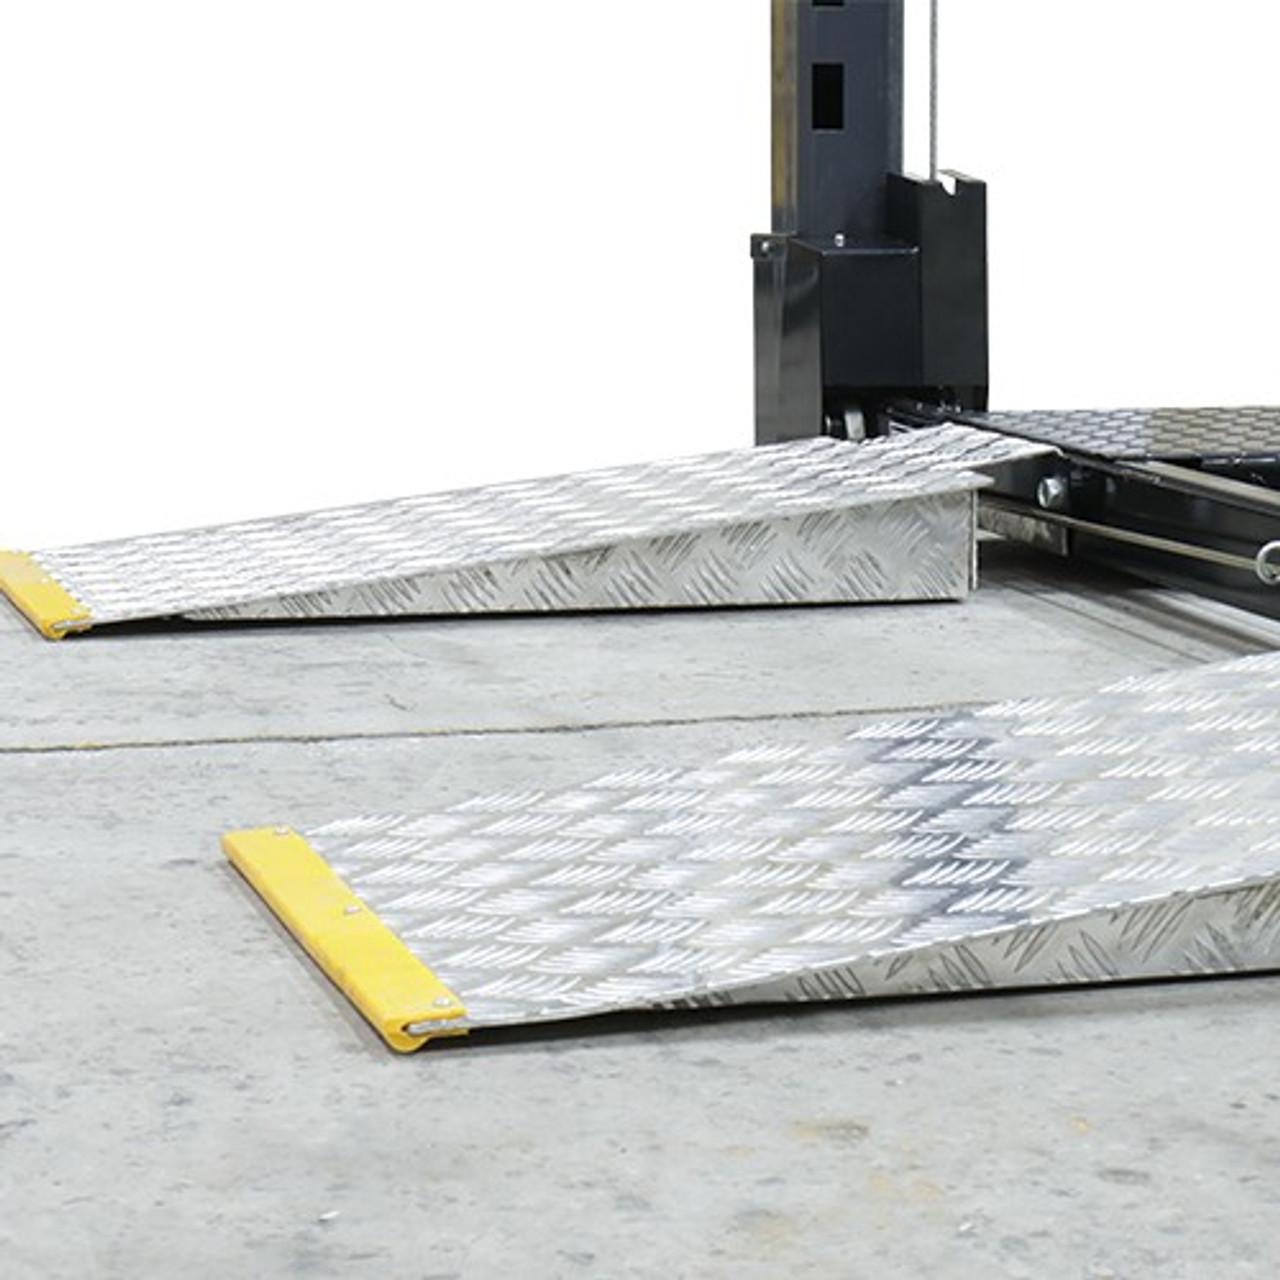 grandprix-aluminum-approach-ramps